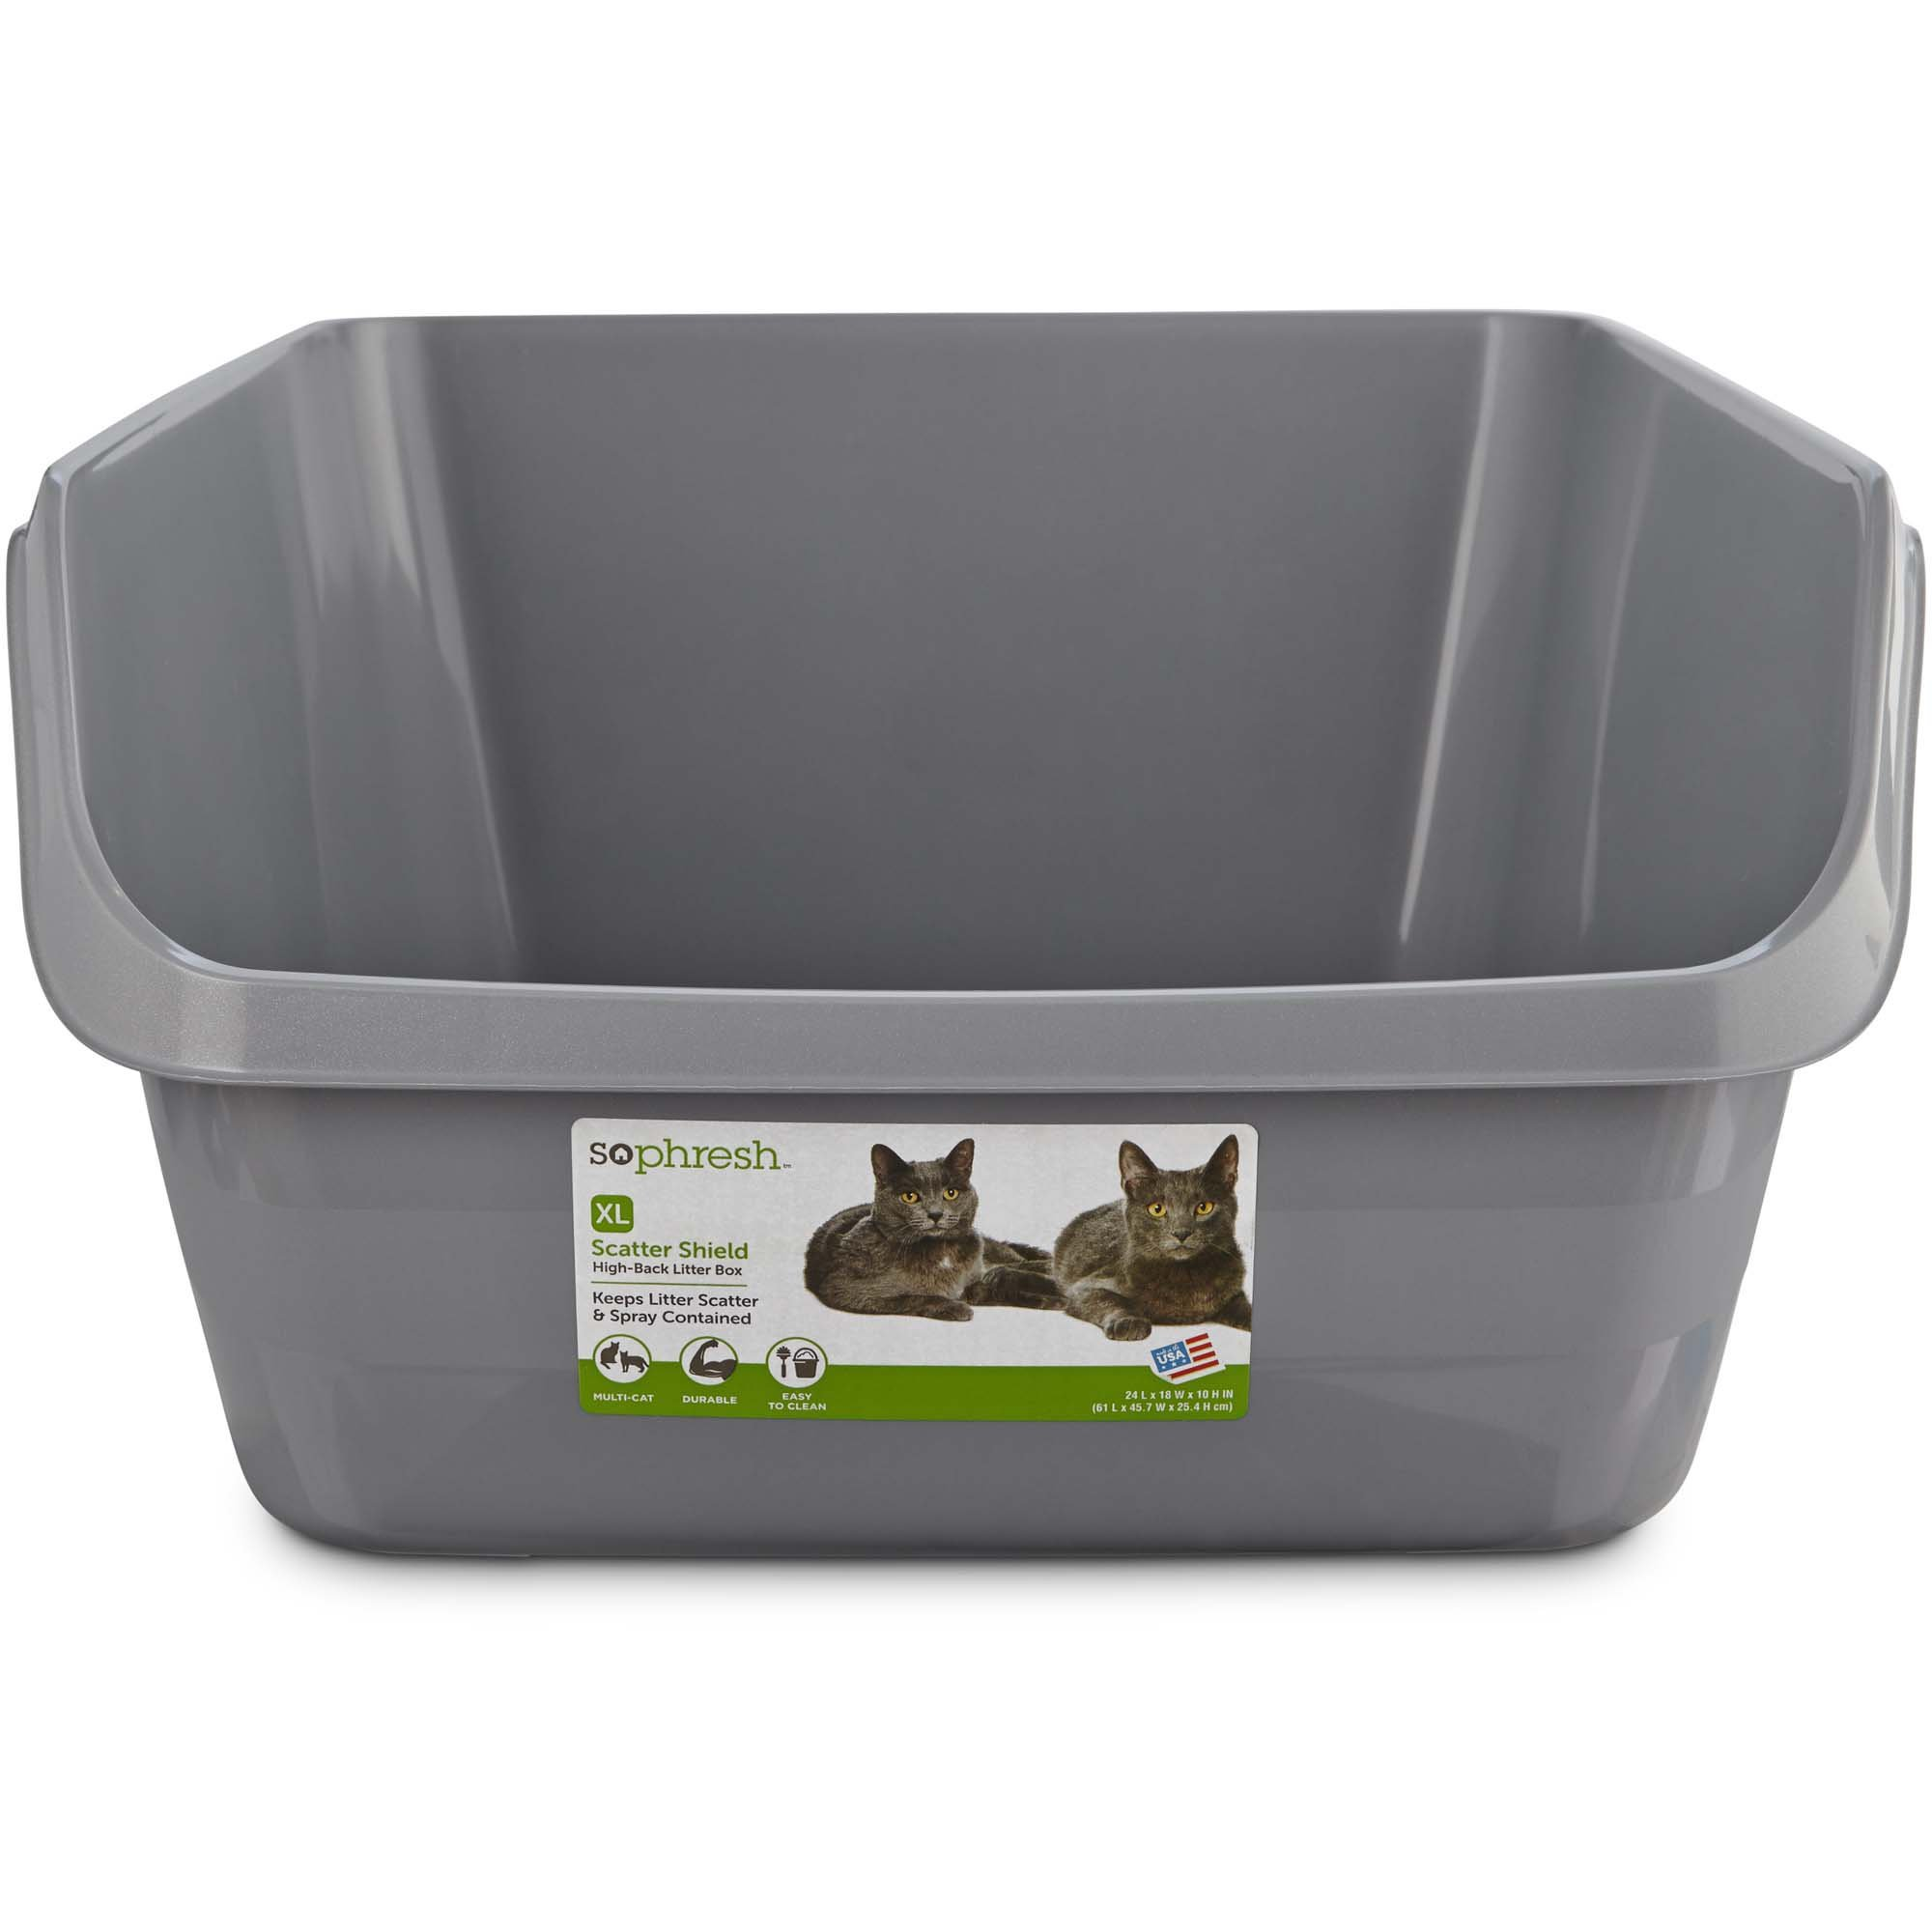 So Phresh Scatter Shield High-Back Litter Box in Gray, 24'' L X 18'' W X 10'' H, Jumbo